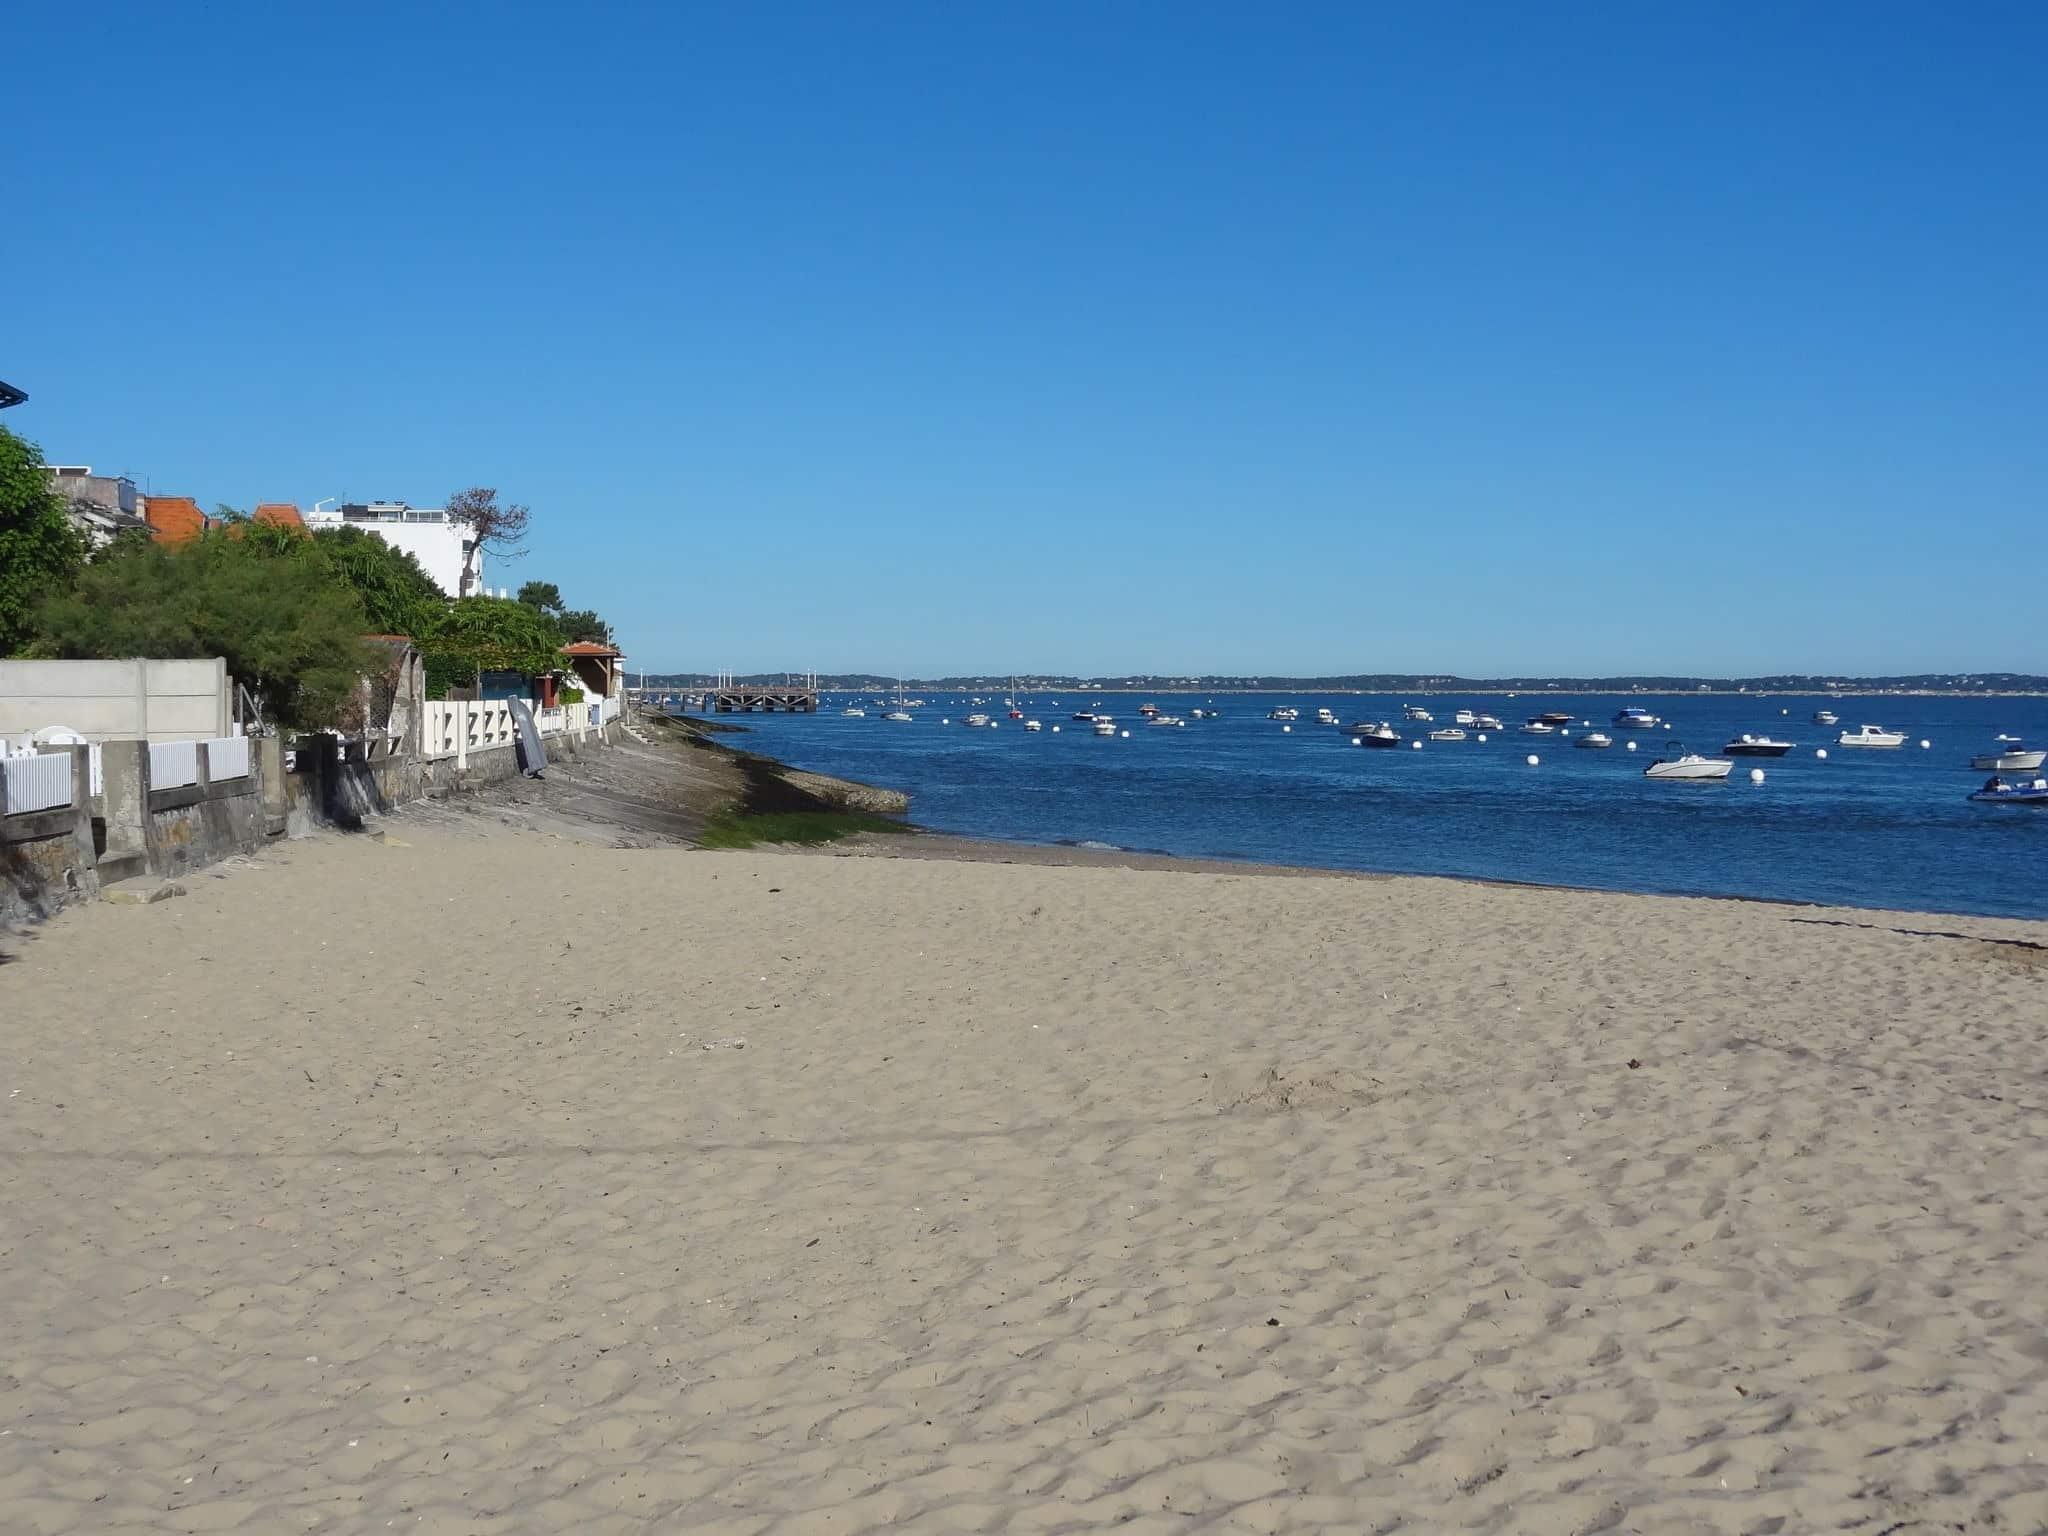 La promenade du front de mer d'Arcachon